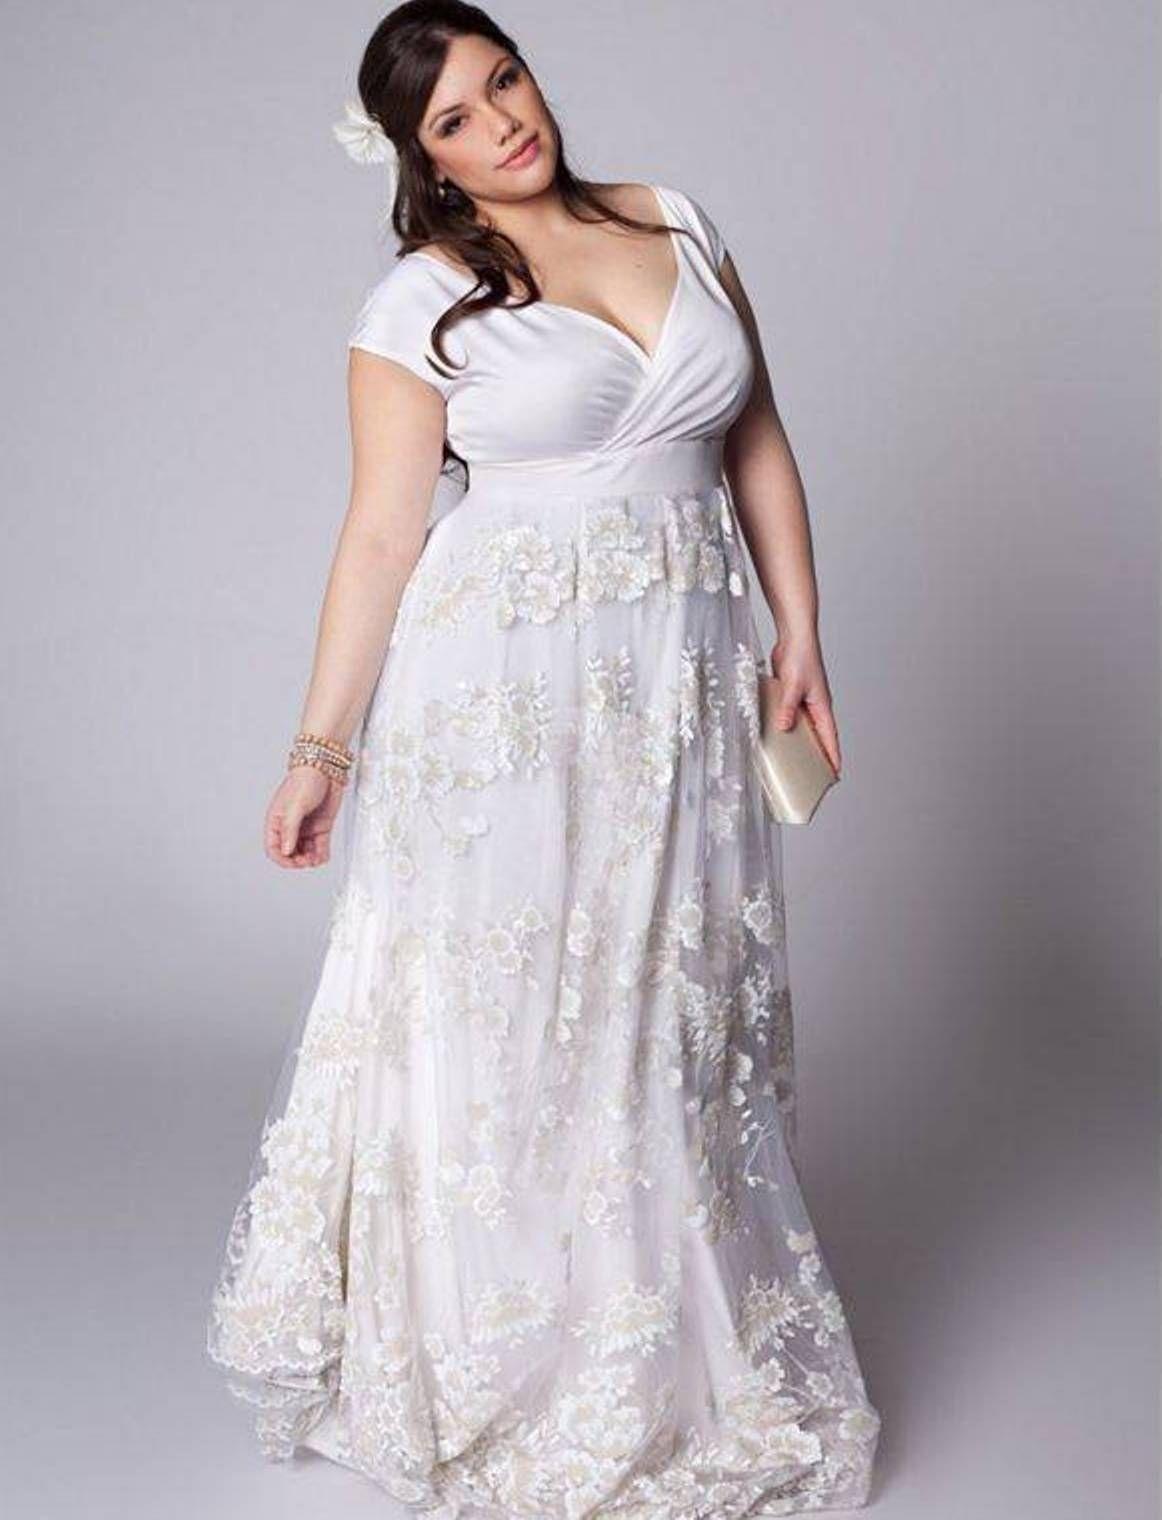 Hawaiian Wedding Dresses Plus Size Wedding Pinterest